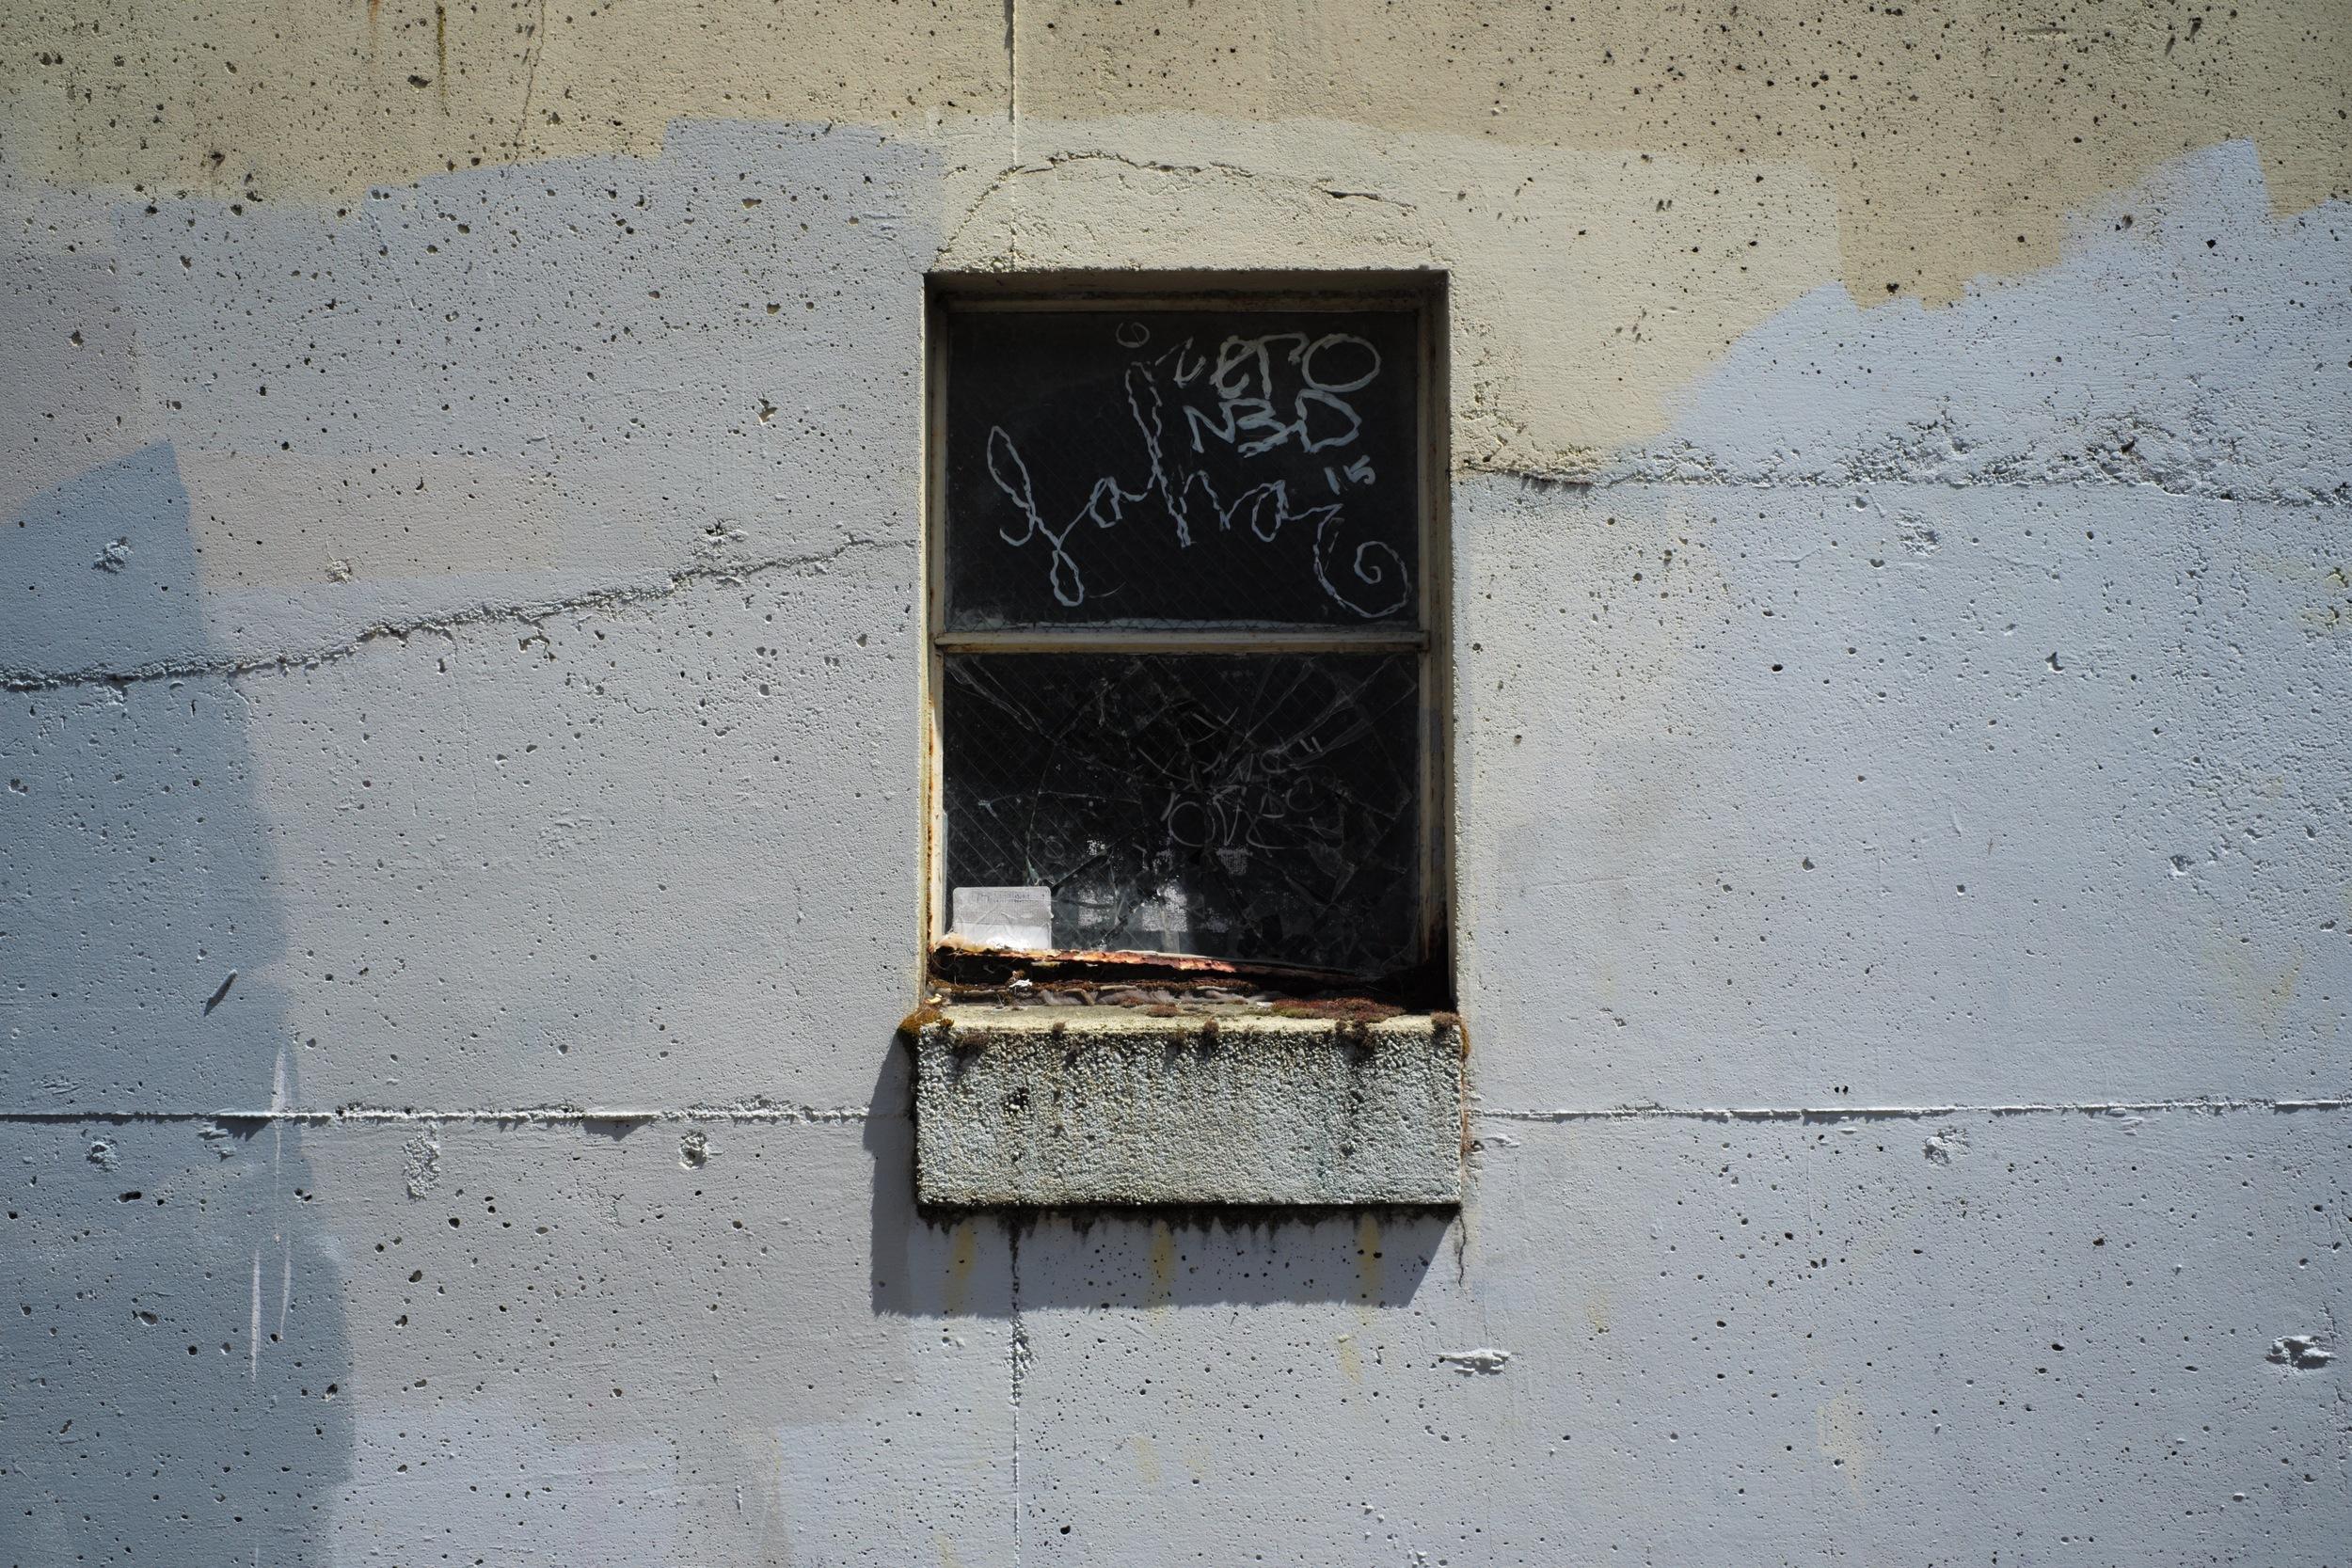 Window, Olympia, WA 2016